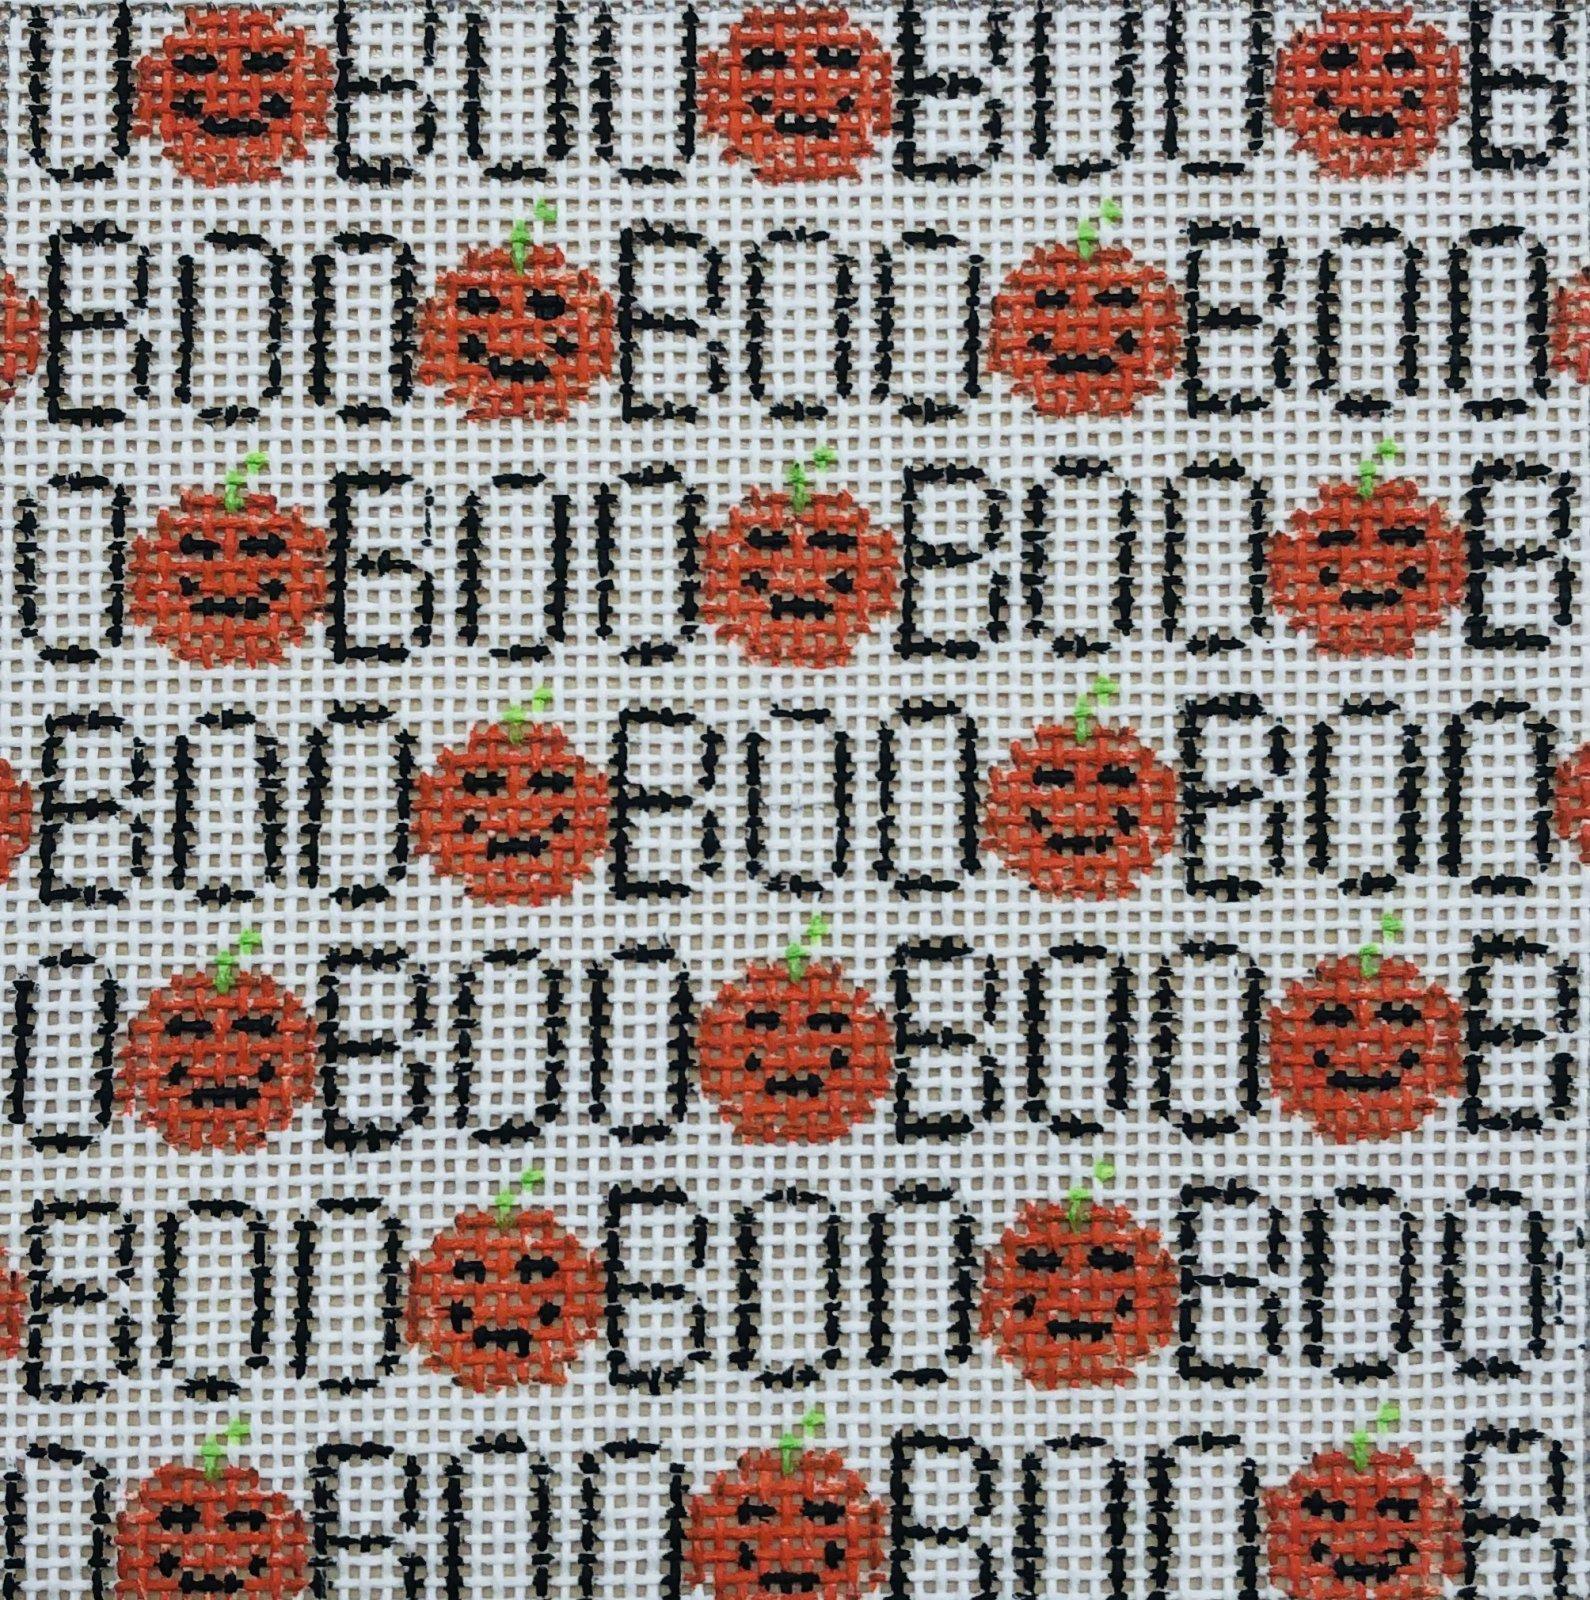 PC-Boo Square Repeat Large  4 x 4  18M